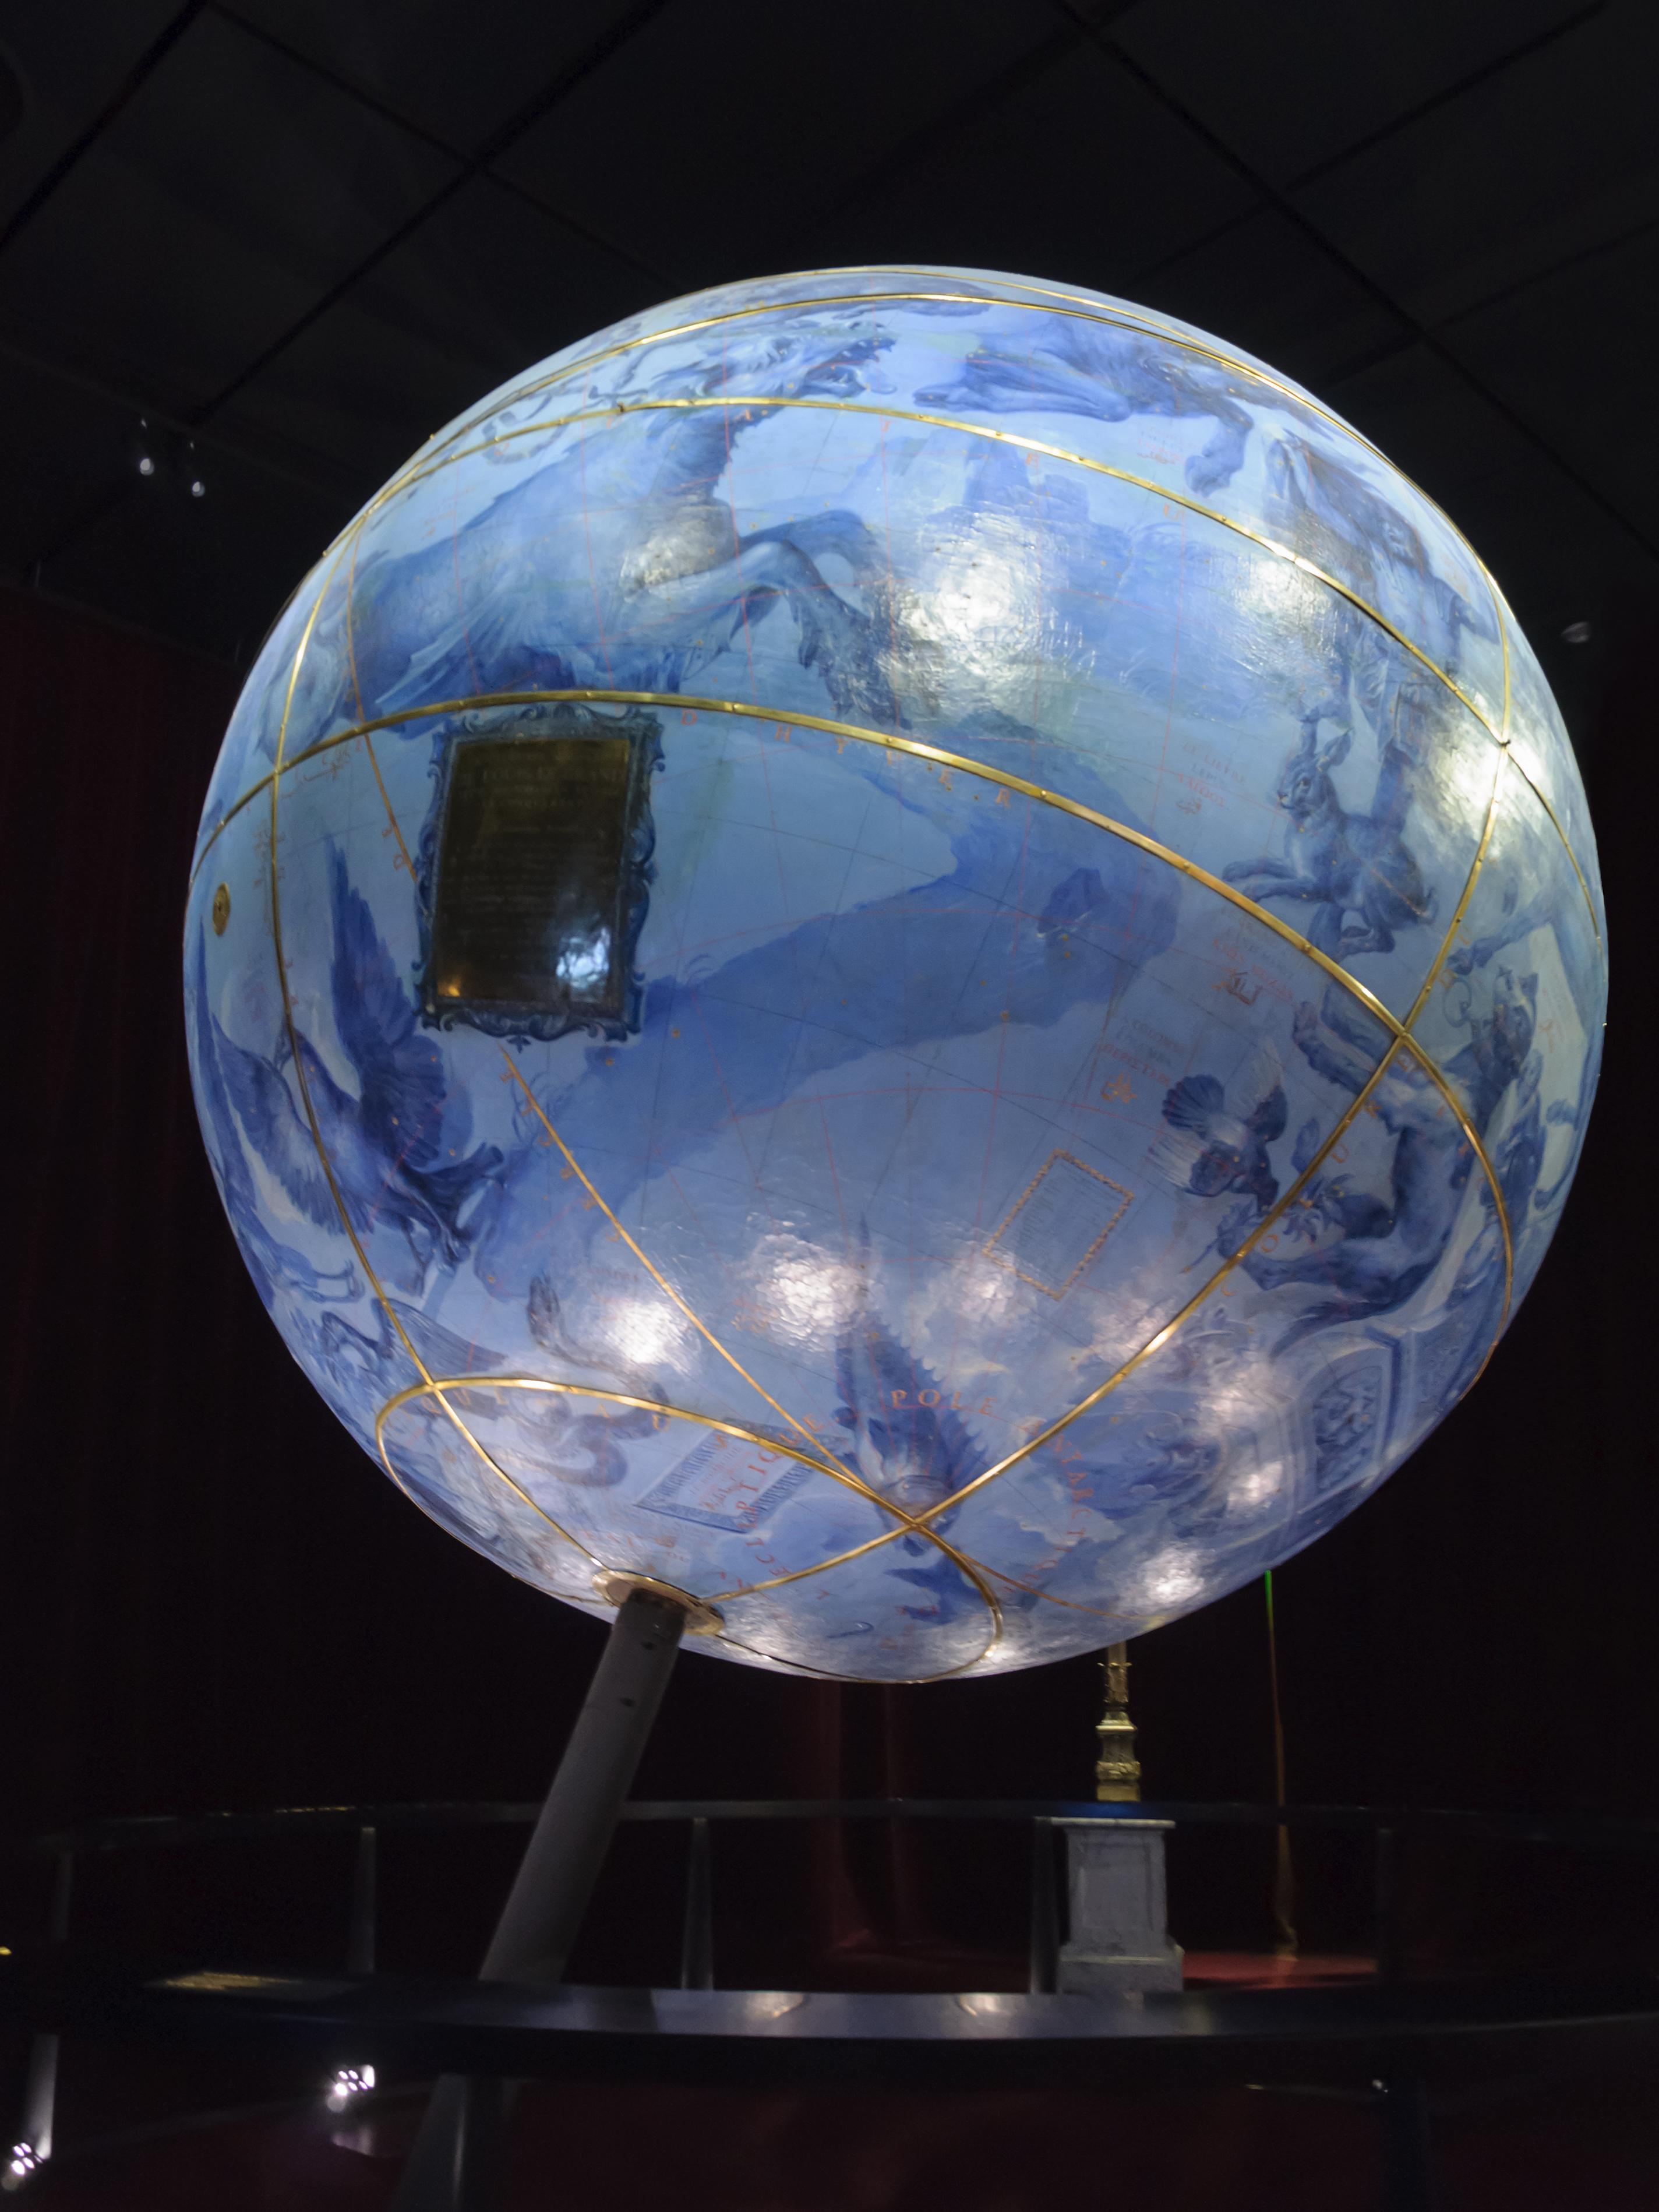 File:Coronelli globe celeste.jpg - Wikimedia Commons